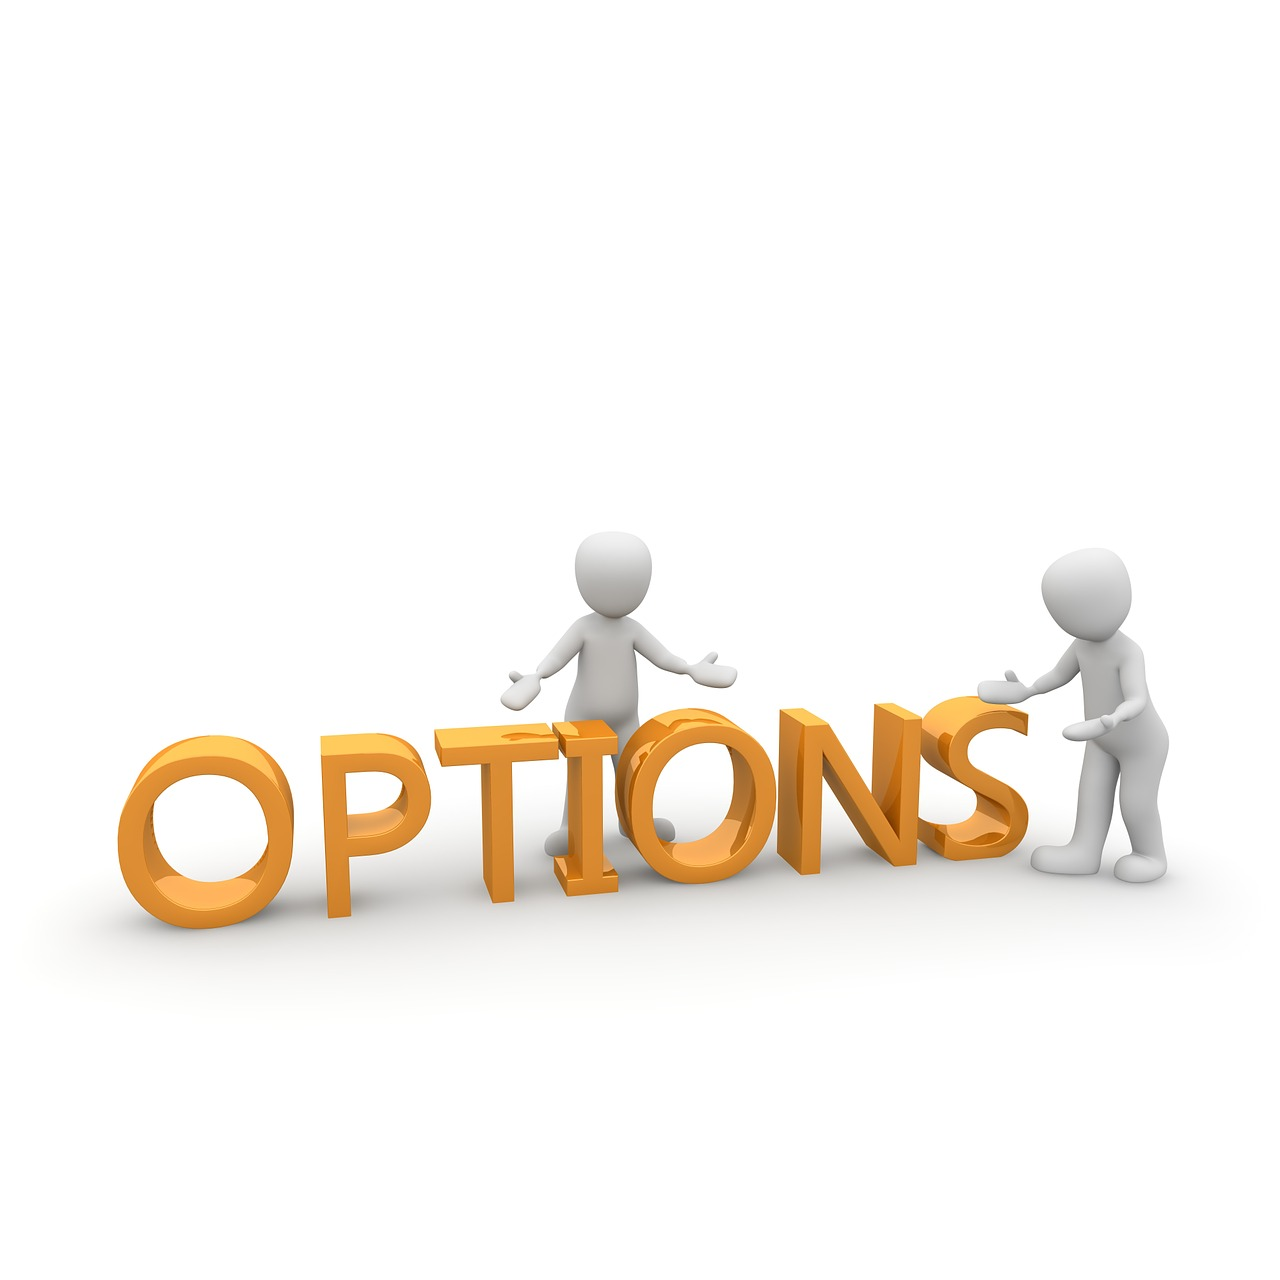 Options representation